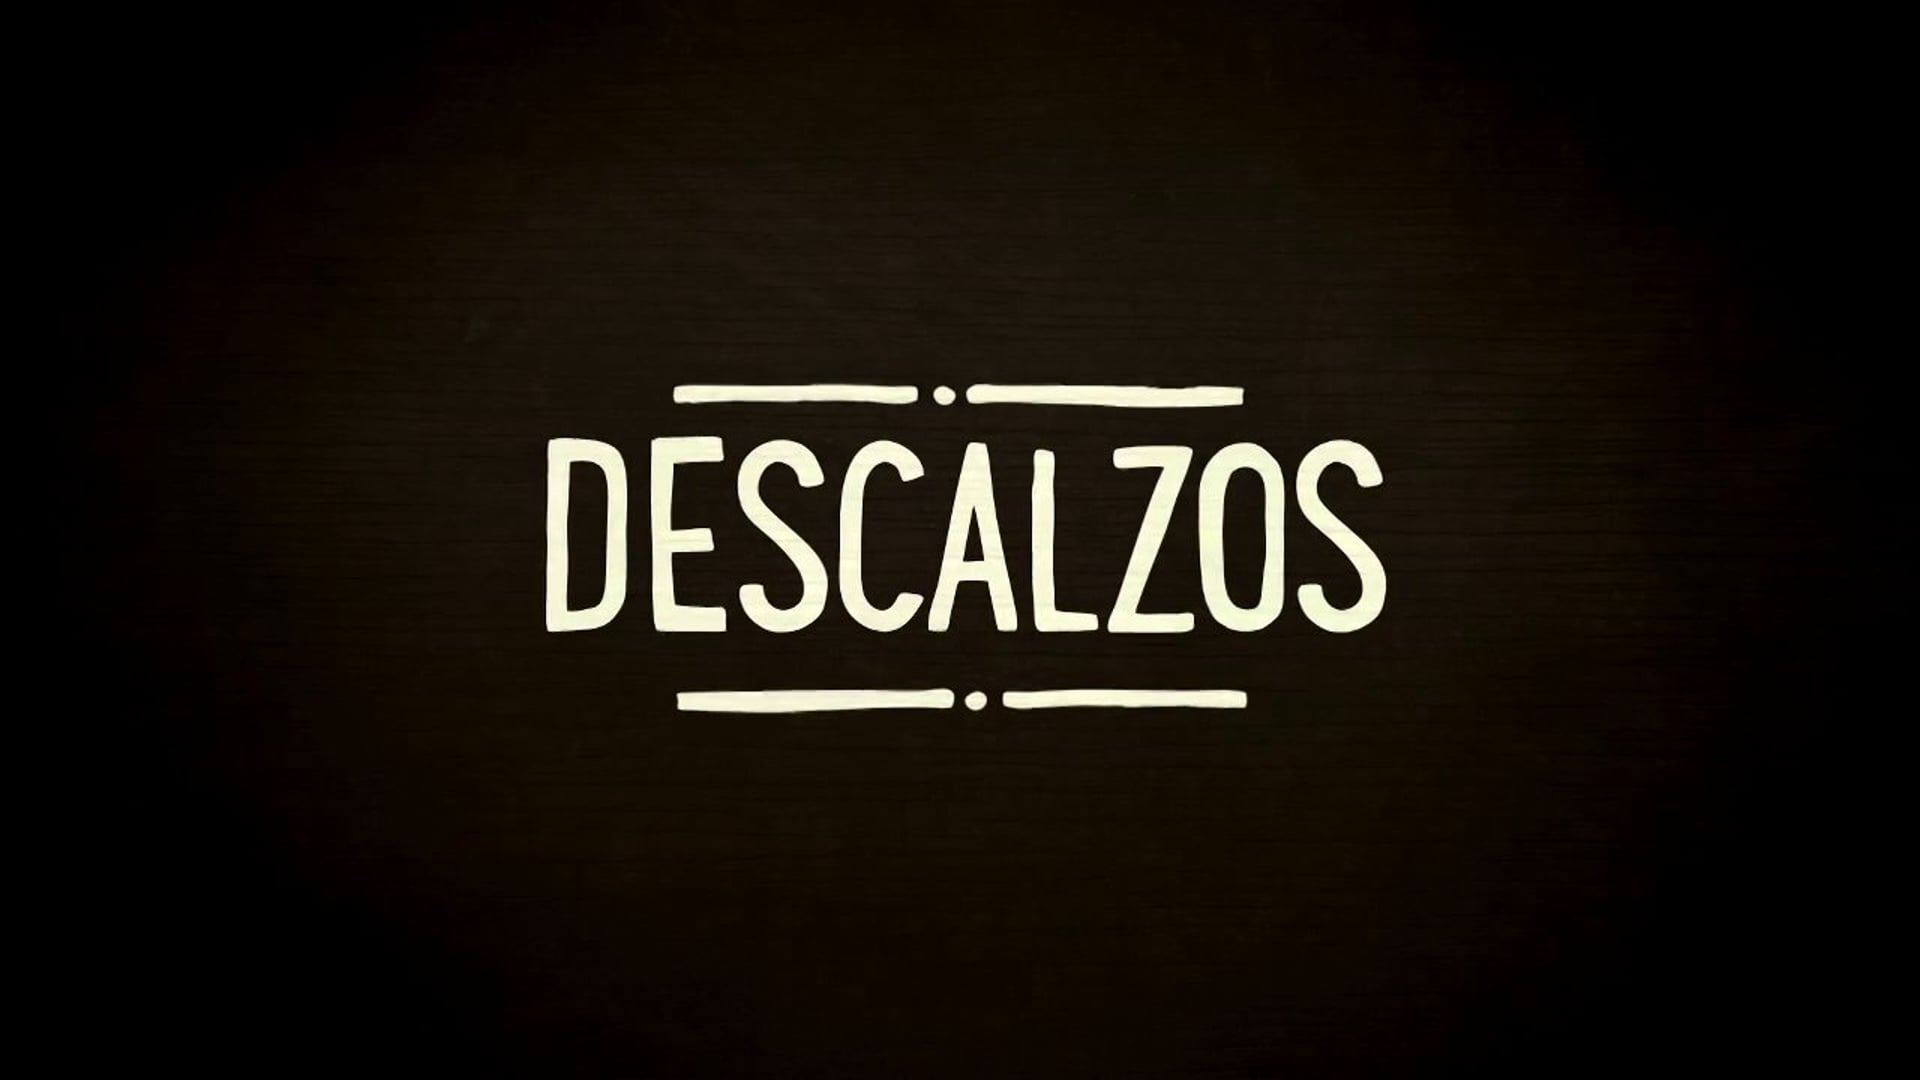 DESCALZOS - Documentary Short (TRAILER)